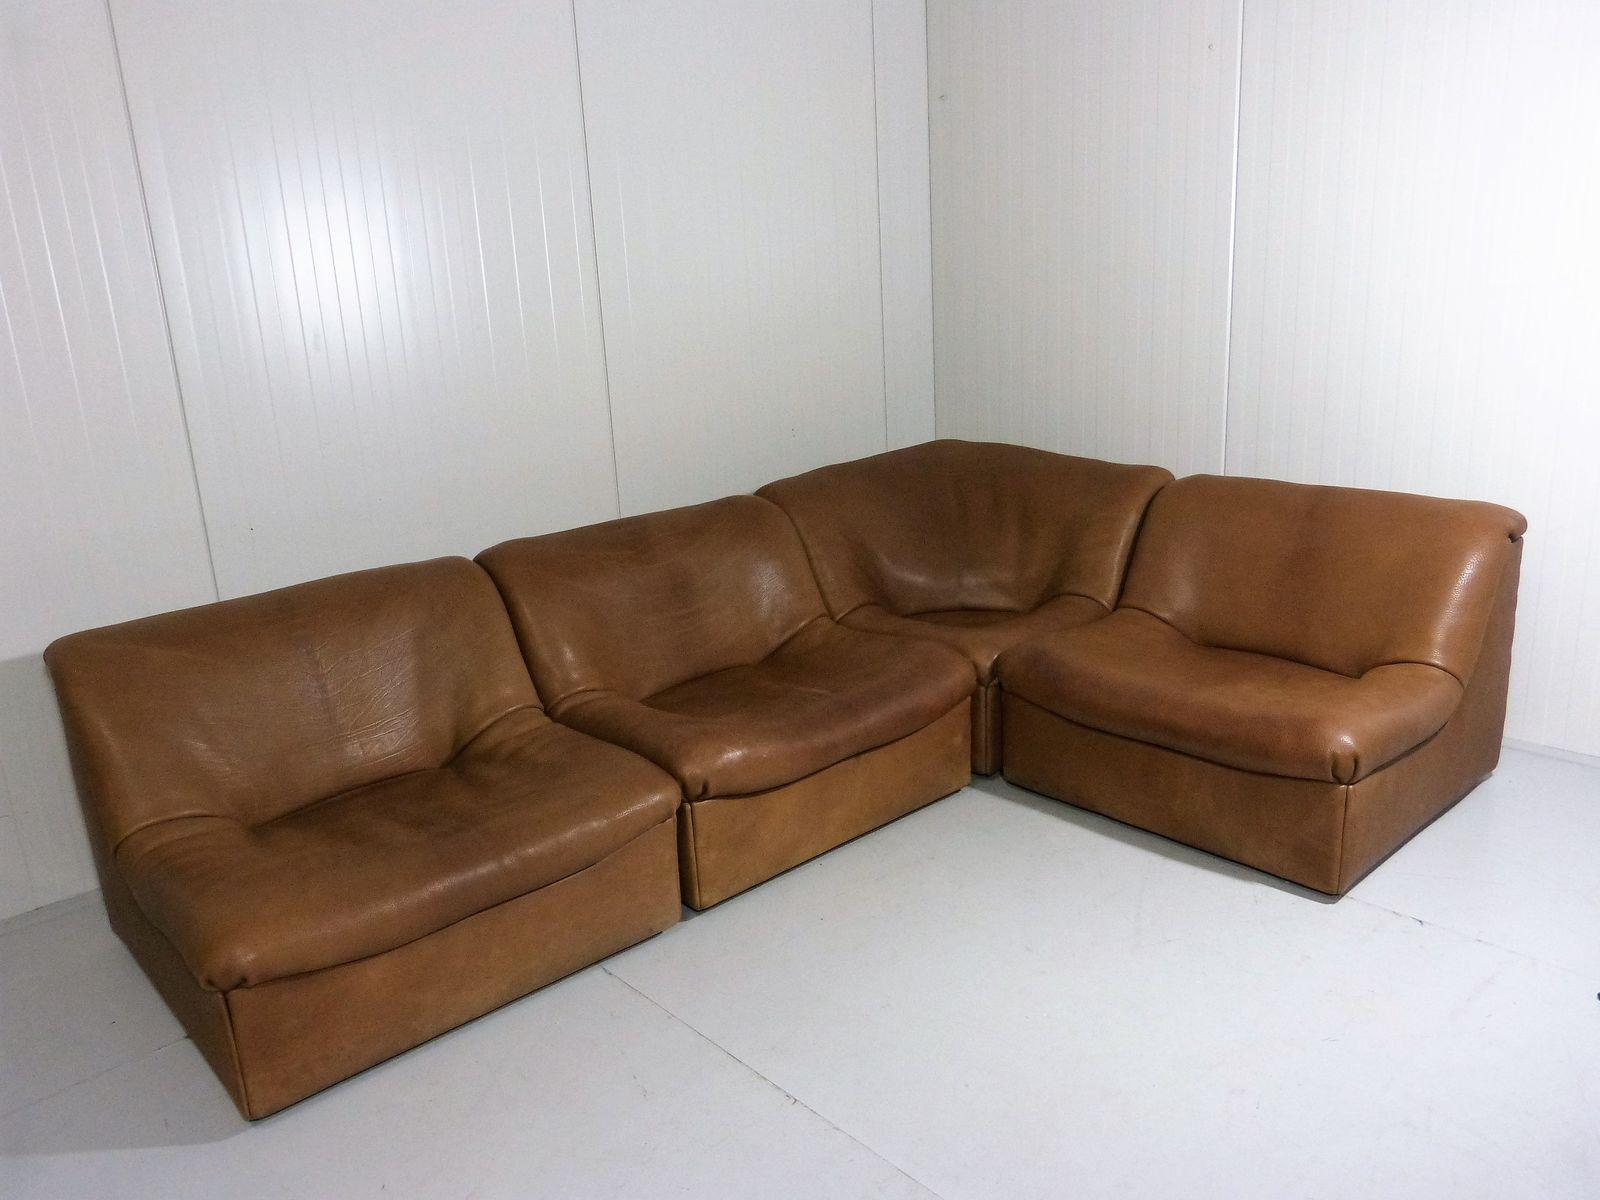 modulares ds 46 sofa aus b ffelleder von de sede 1970er. Black Bedroom Furniture Sets. Home Design Ideas